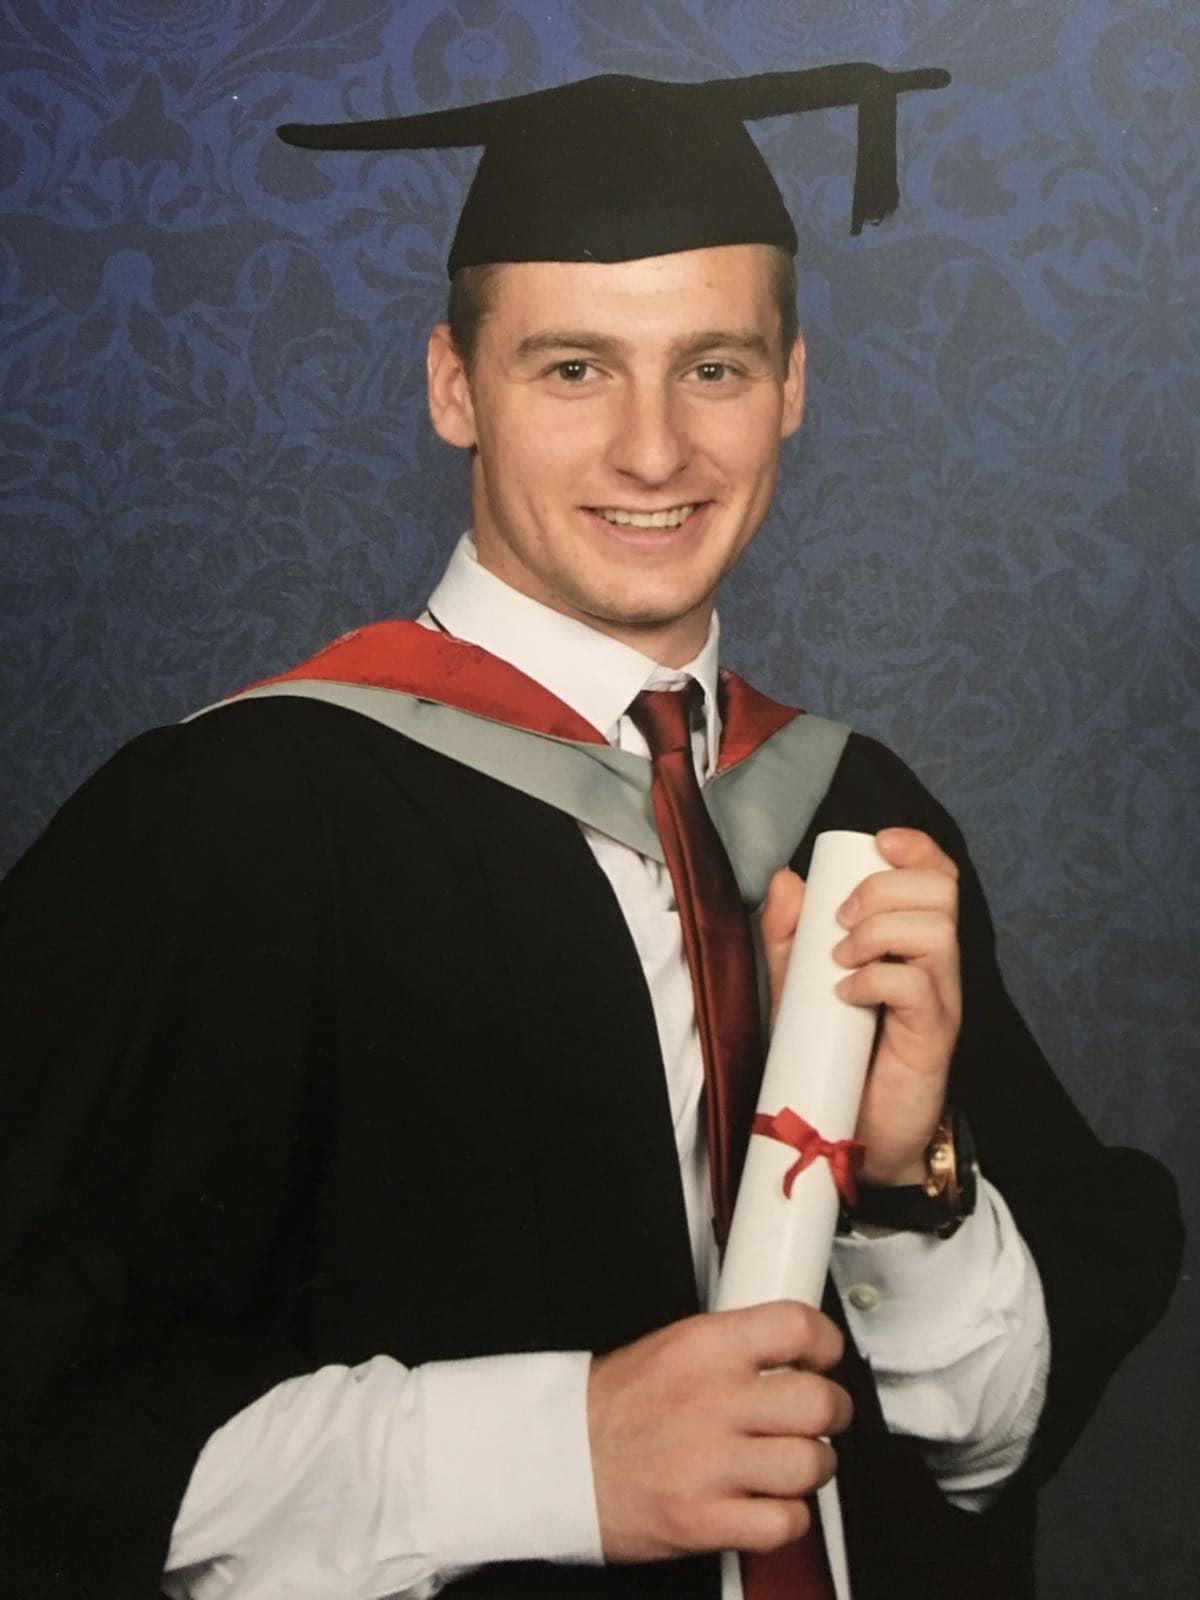 graduation photo of lloyd grieves